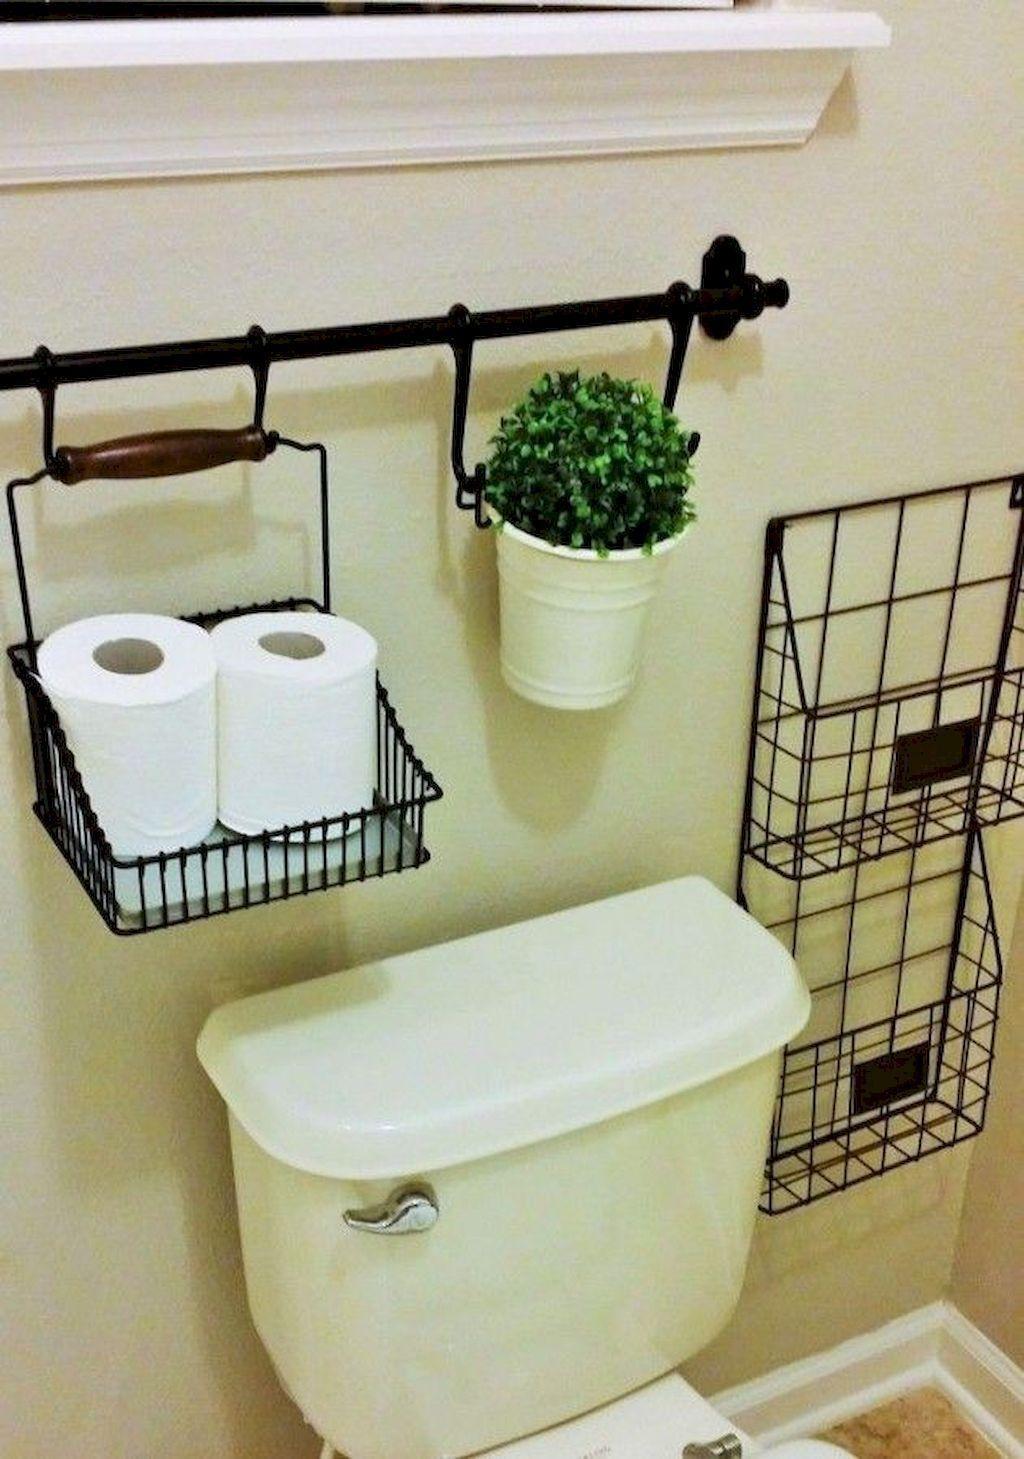 Minimalist Bathroom Storage Organization Ideas 20 Diy Bathroom Storage Simple Bathroom Small Bathroom Storage